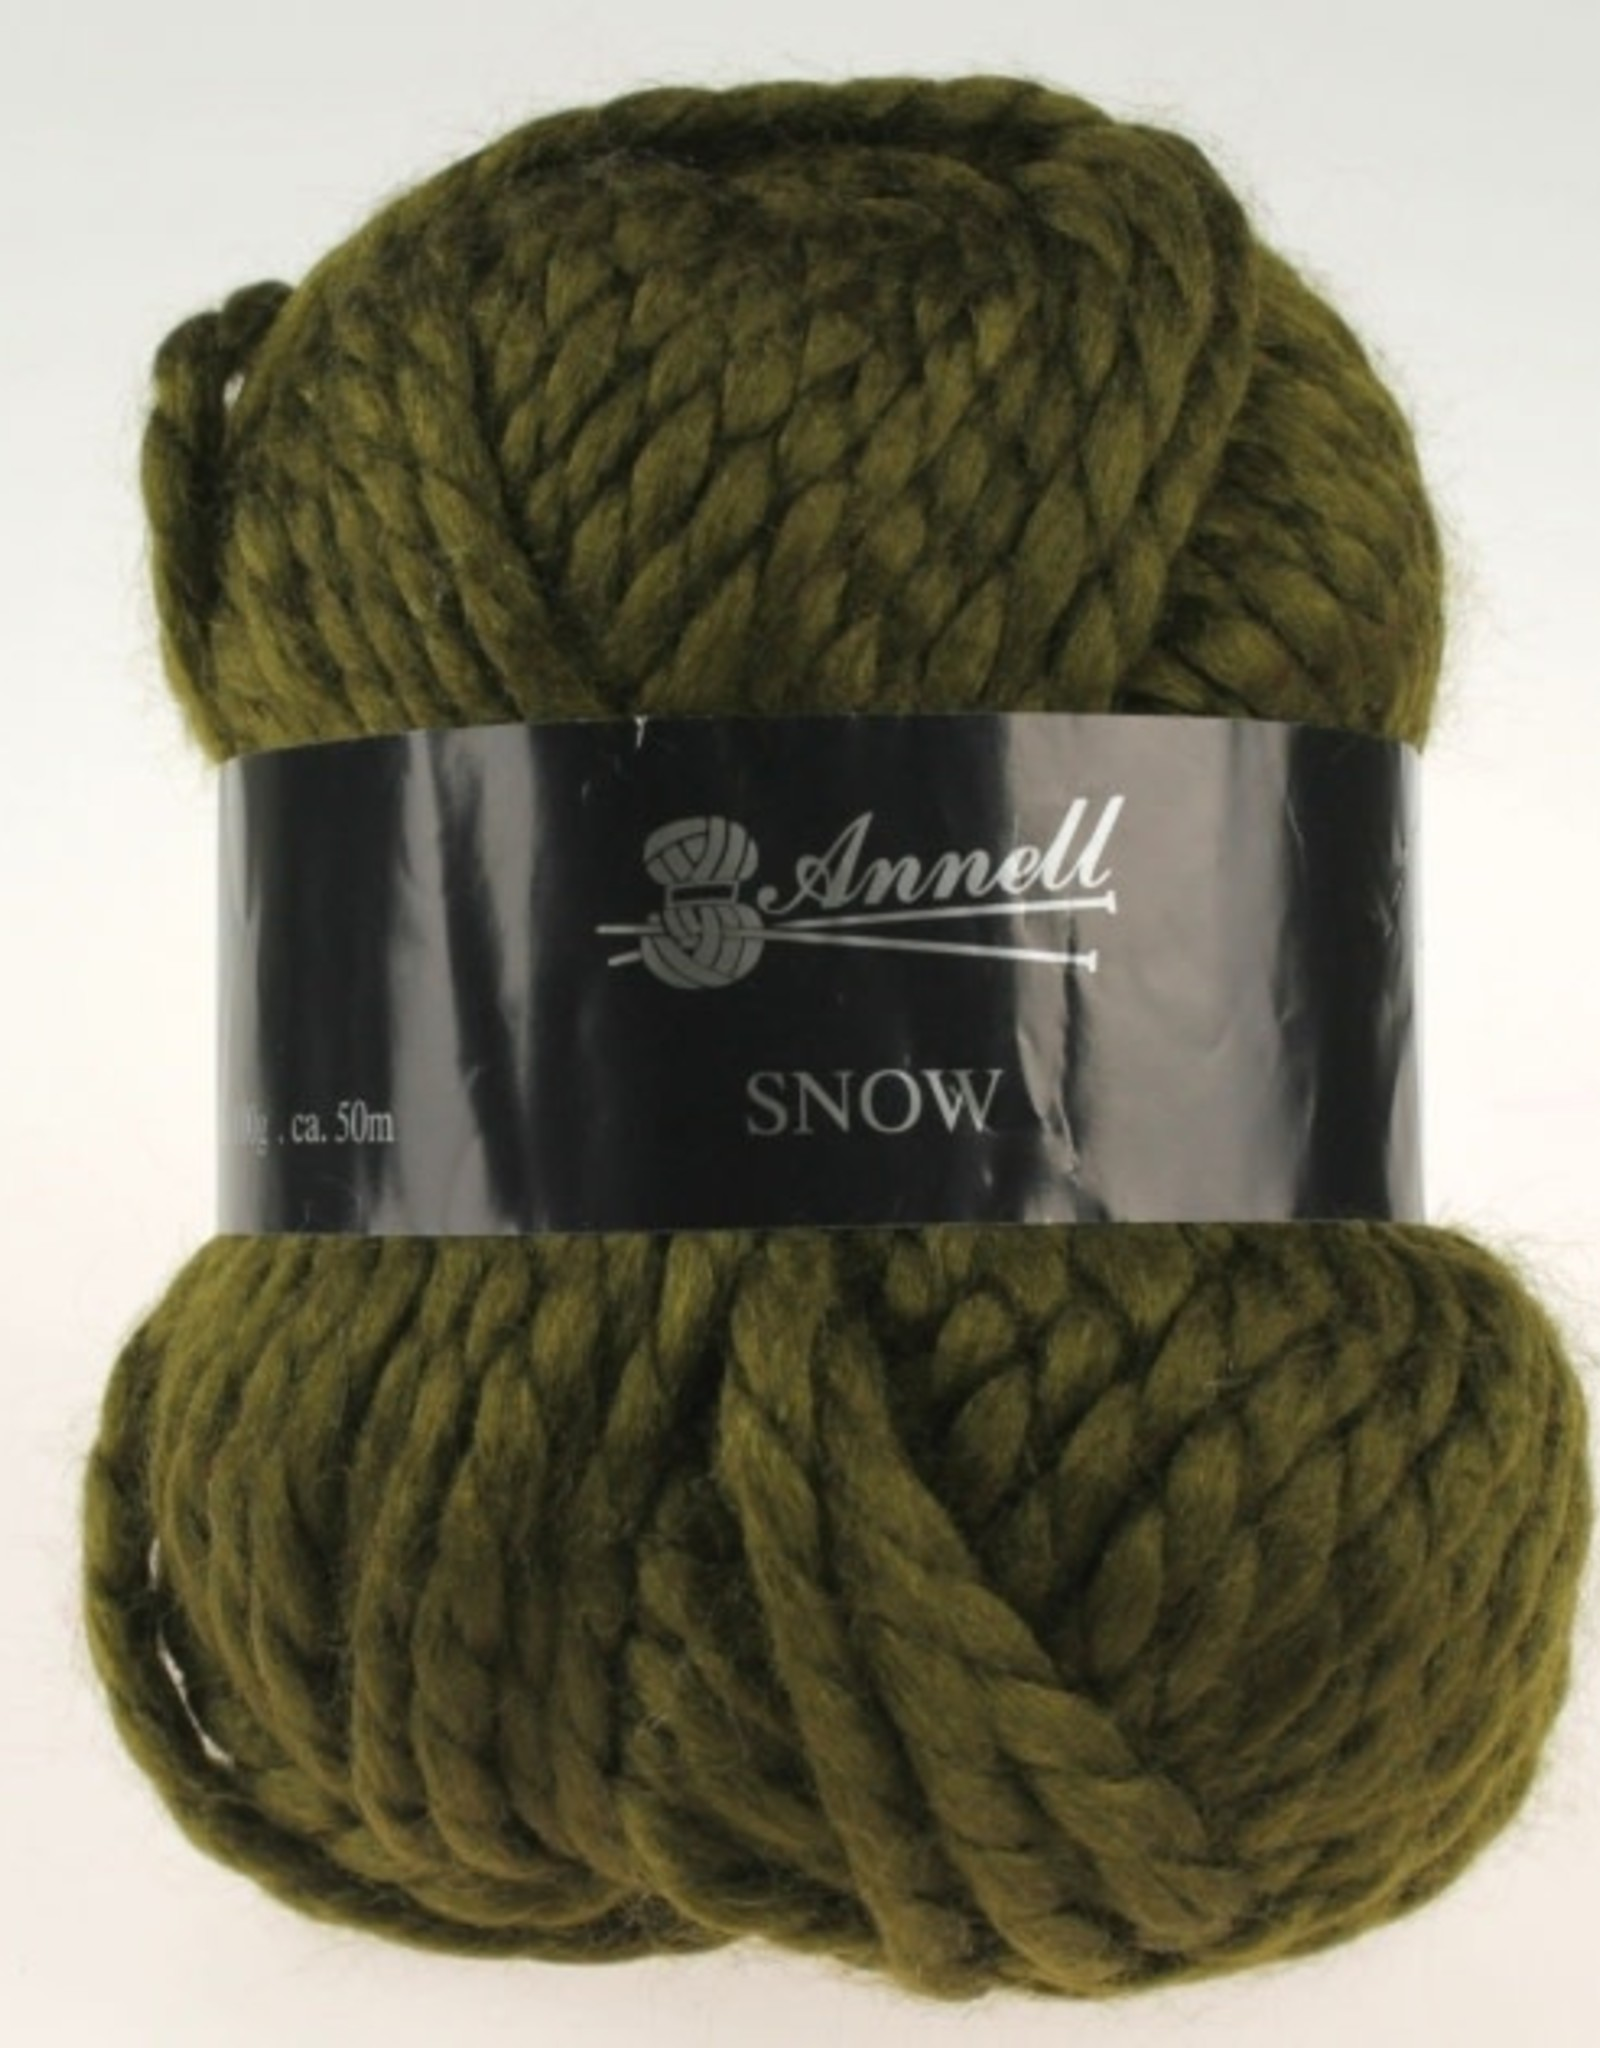 Annell Annell Snow 3949